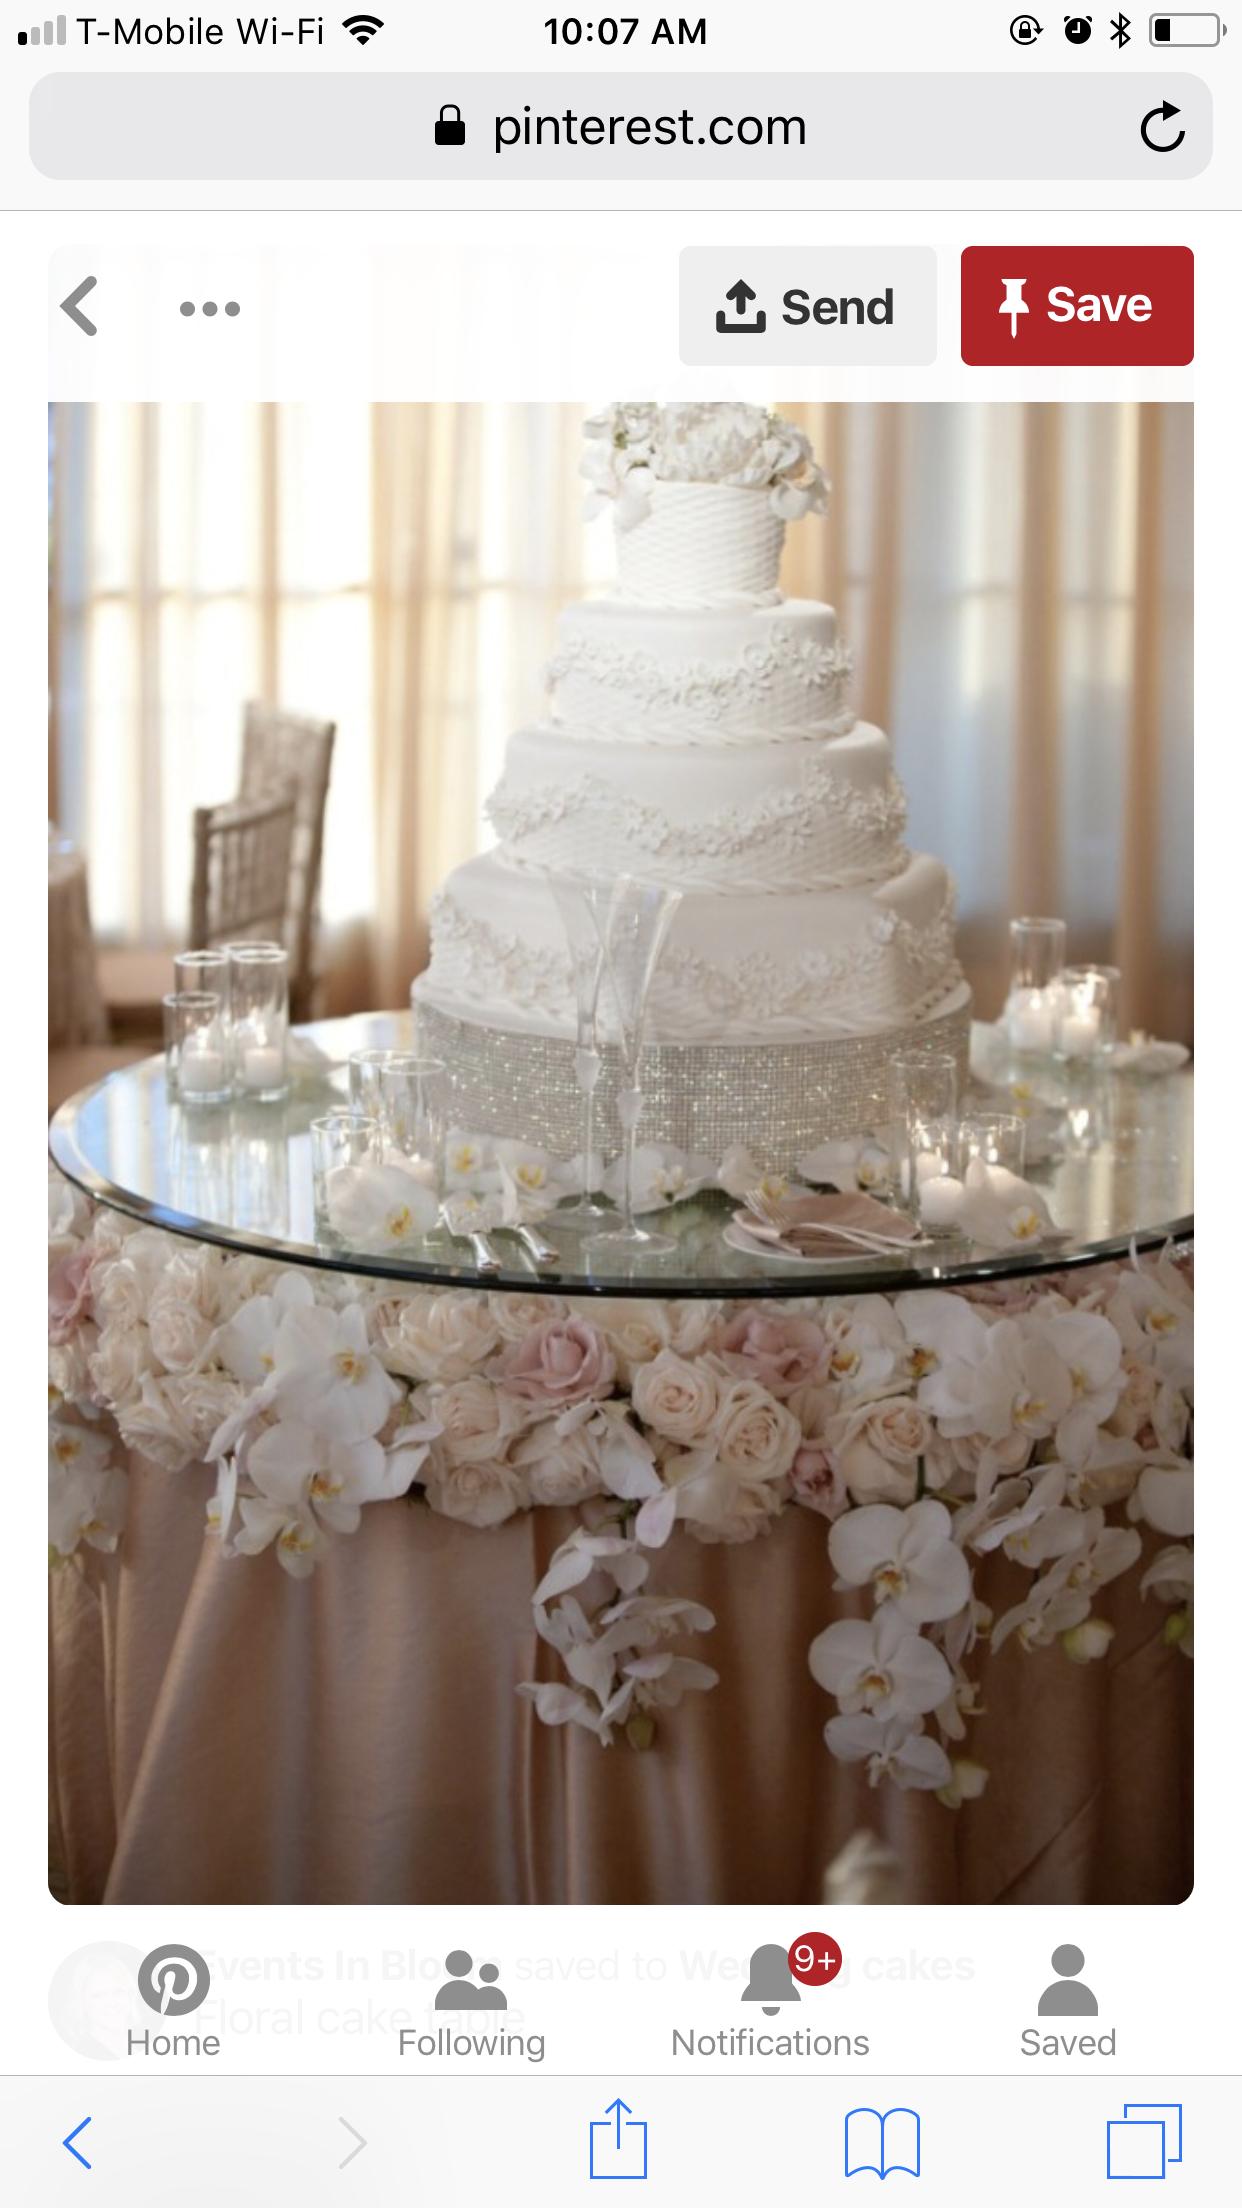 Flowers Underneath Glass Table Wedding Cake Table Party Decor Wedding Cake Table Decorations Wedding Cake Table Cake Table Decorations